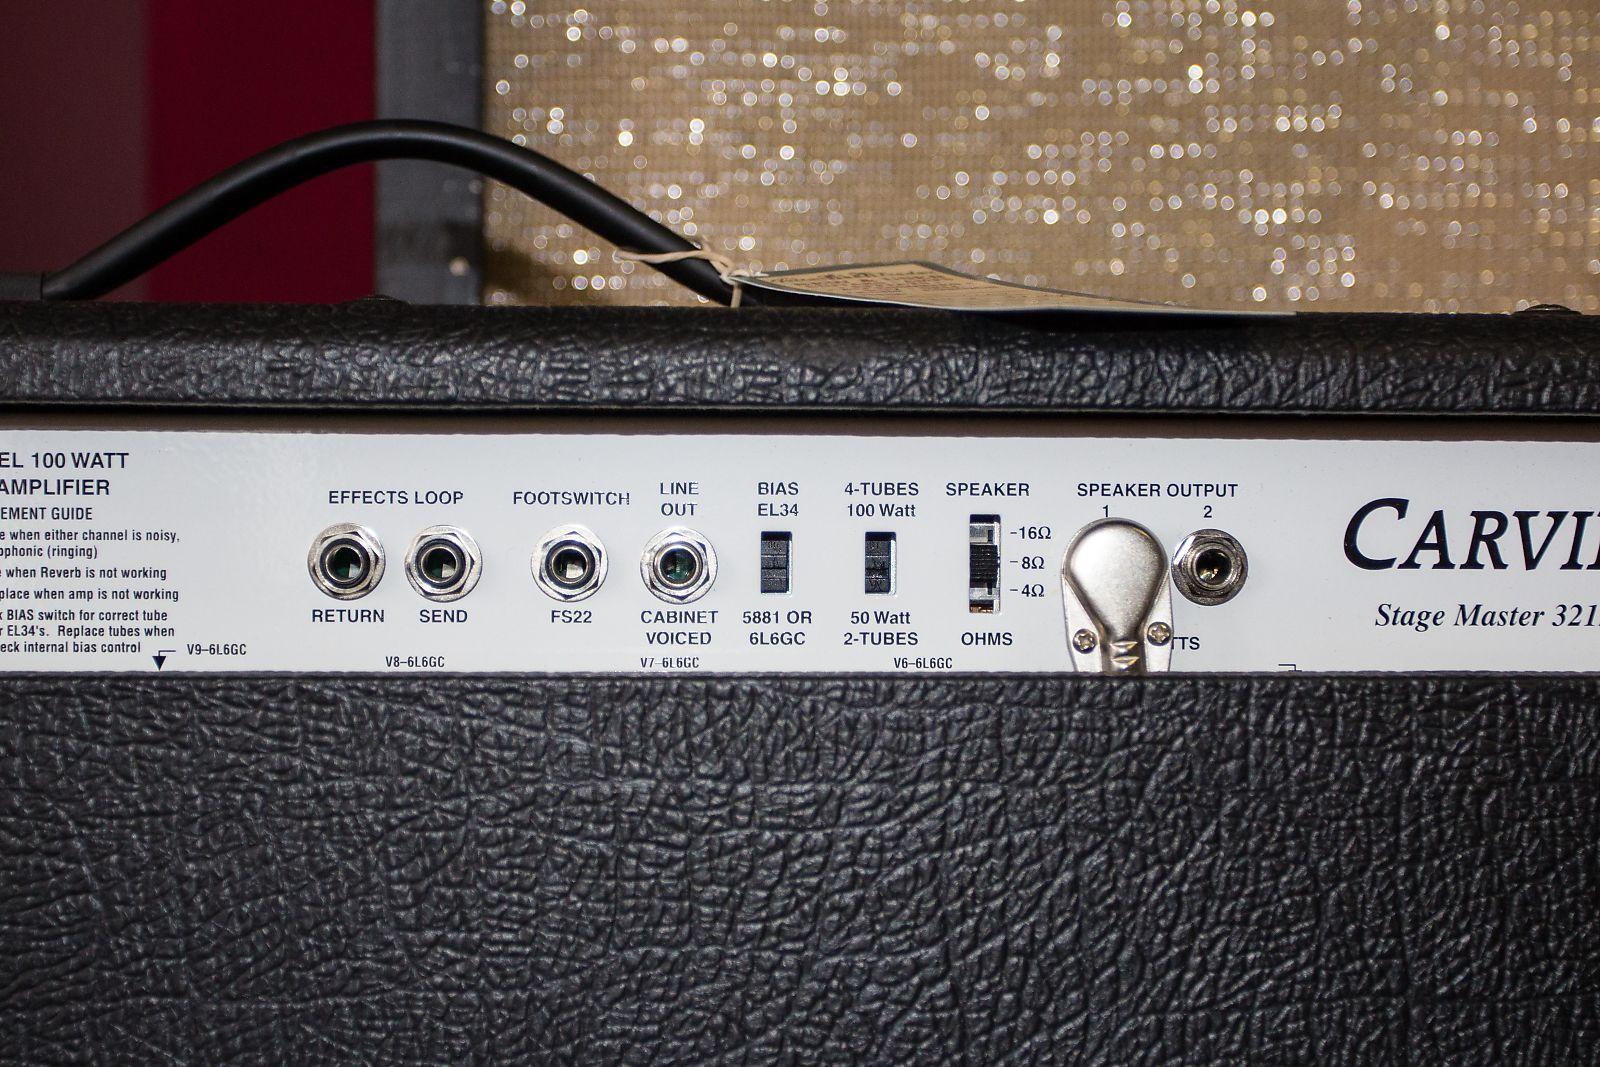 Carvin Stage Master 3212 100 Watt Tube Guitar Amp Usa Amplifier